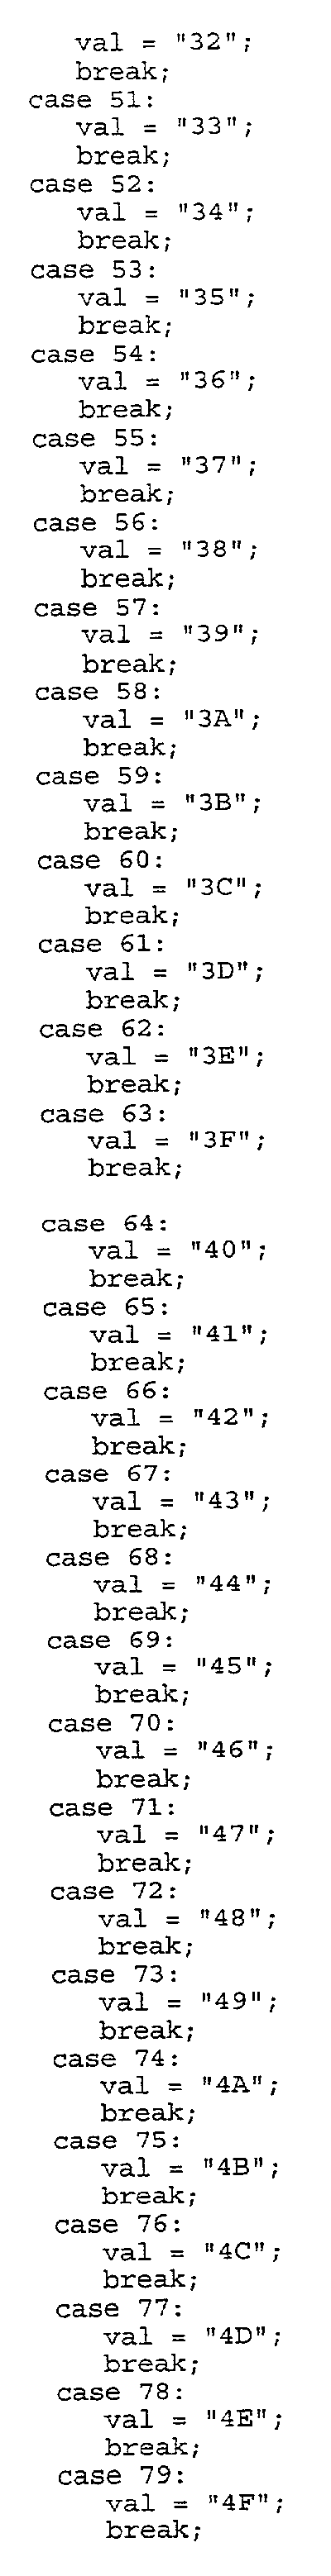 Figure US20020113824A1-20020822-P00154